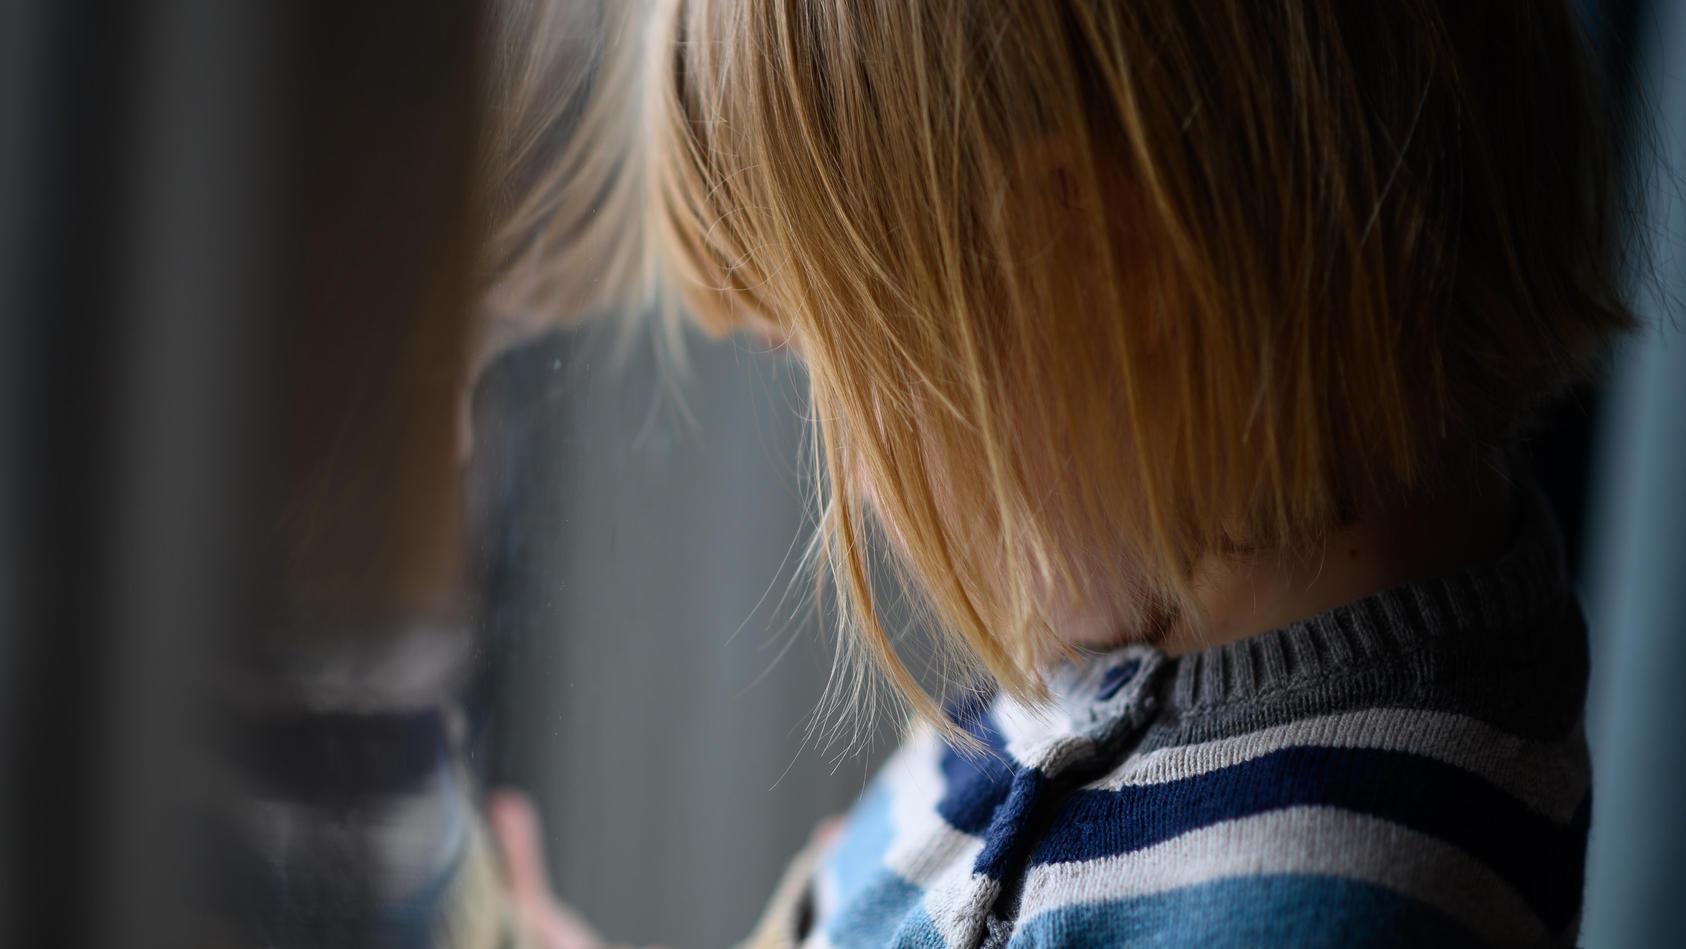 Kind schaut aus dem Fenster